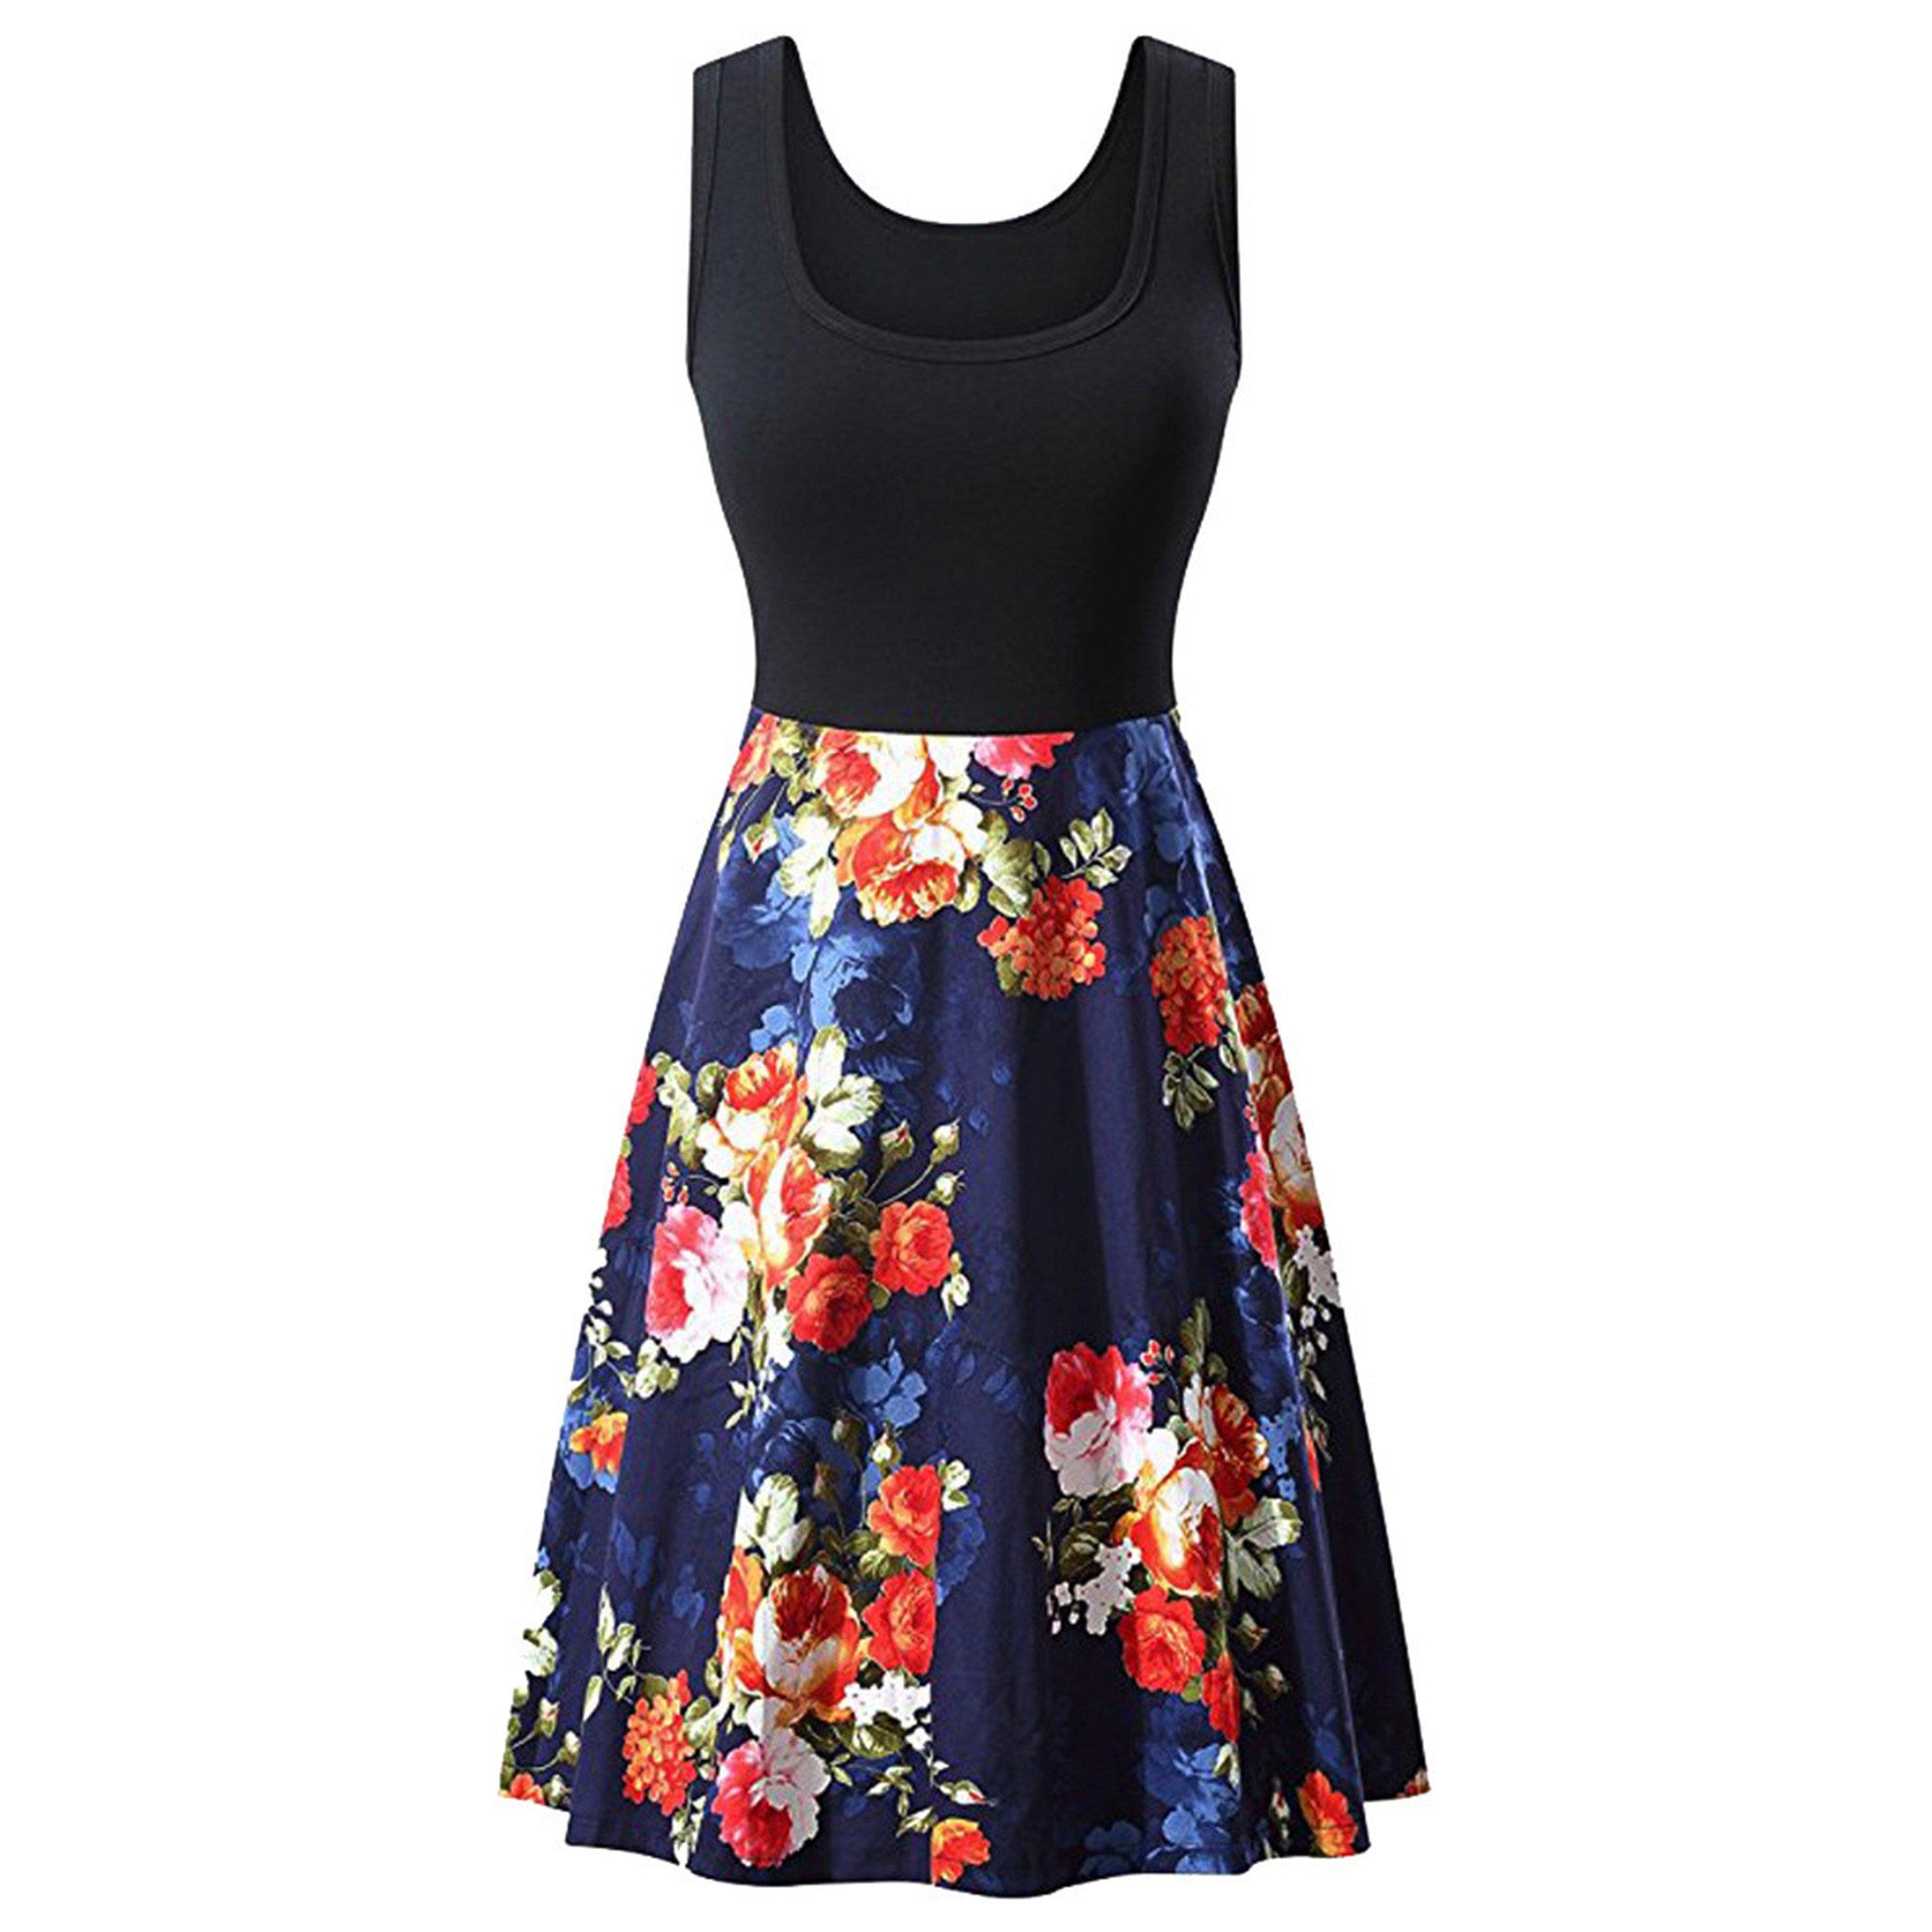 Londony Hot Women's 1950s Butterfly Floral Vintage Dresses Audrey Hepburn Style Party Dresses (❤️B-Navy, XL)